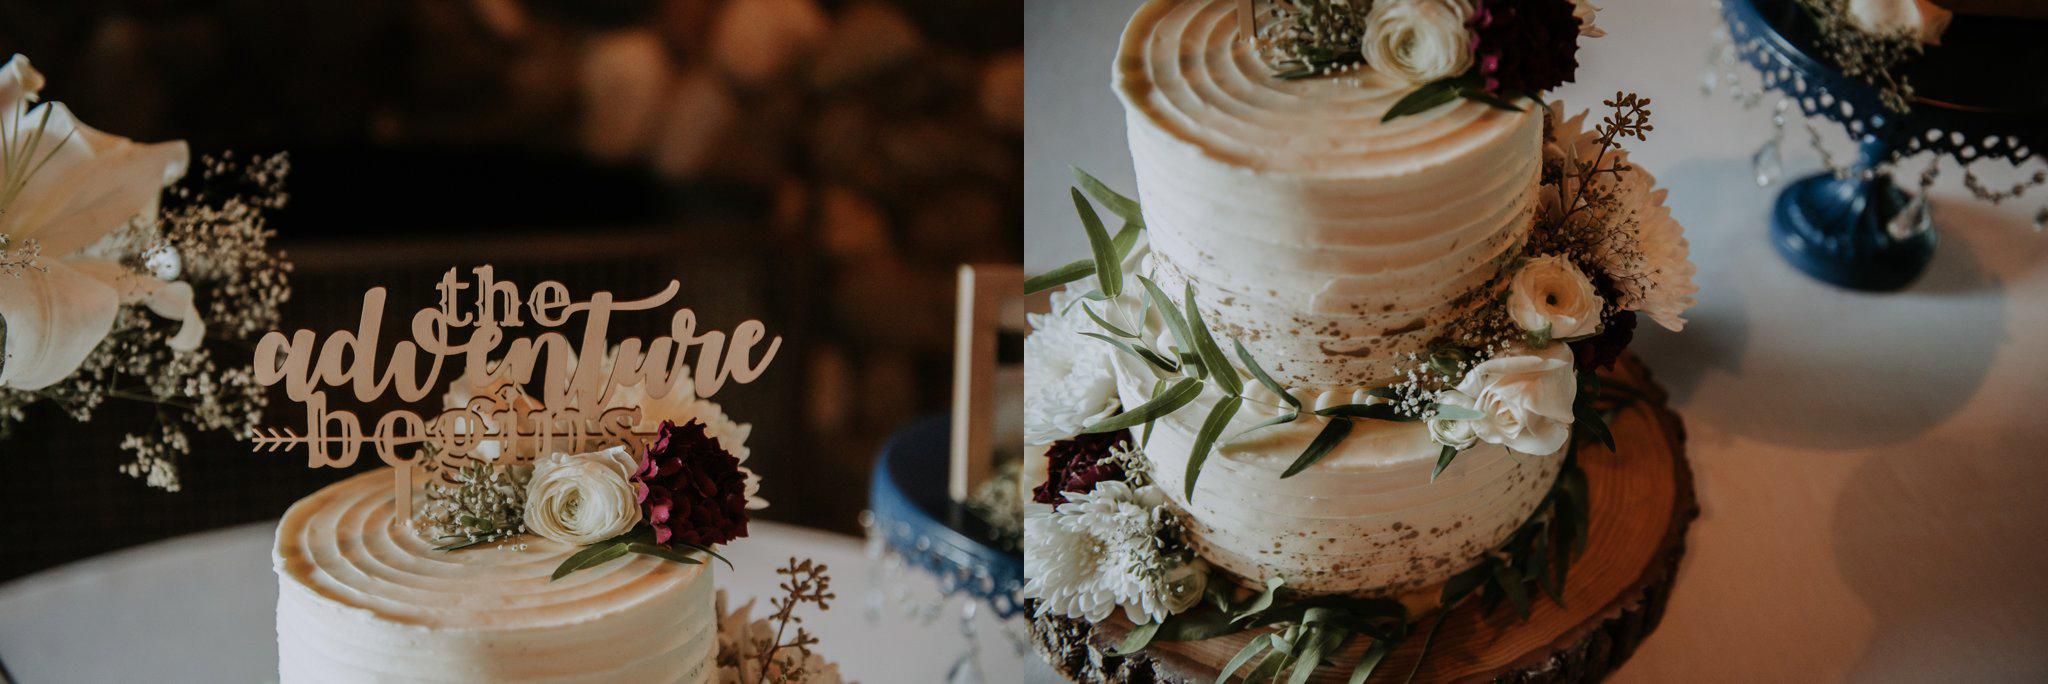 kristen-and-cody-the-kelley-farm-wedding-seattle-photographer-caitlyn-nikula-77.jpg